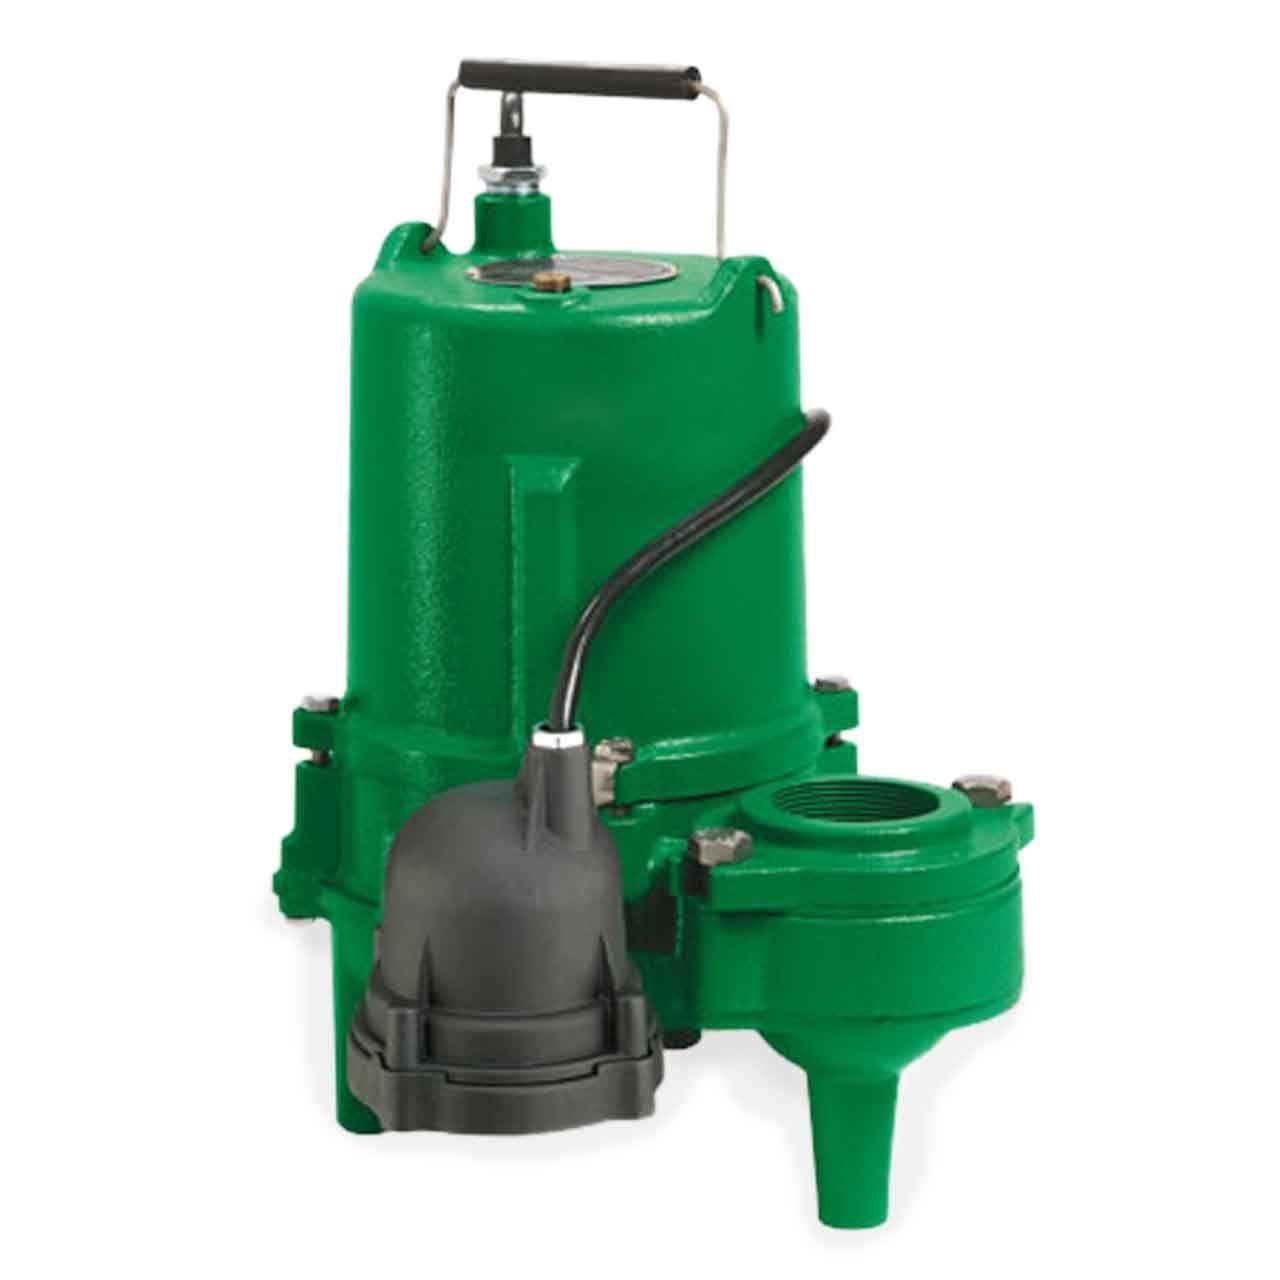 myers myers msp50m1 submersible sewage pump 0 5 hp 115v 1ph manual rh rcworst com Septic Pump Wiring Diagram Septic Pump Wiring Diagram